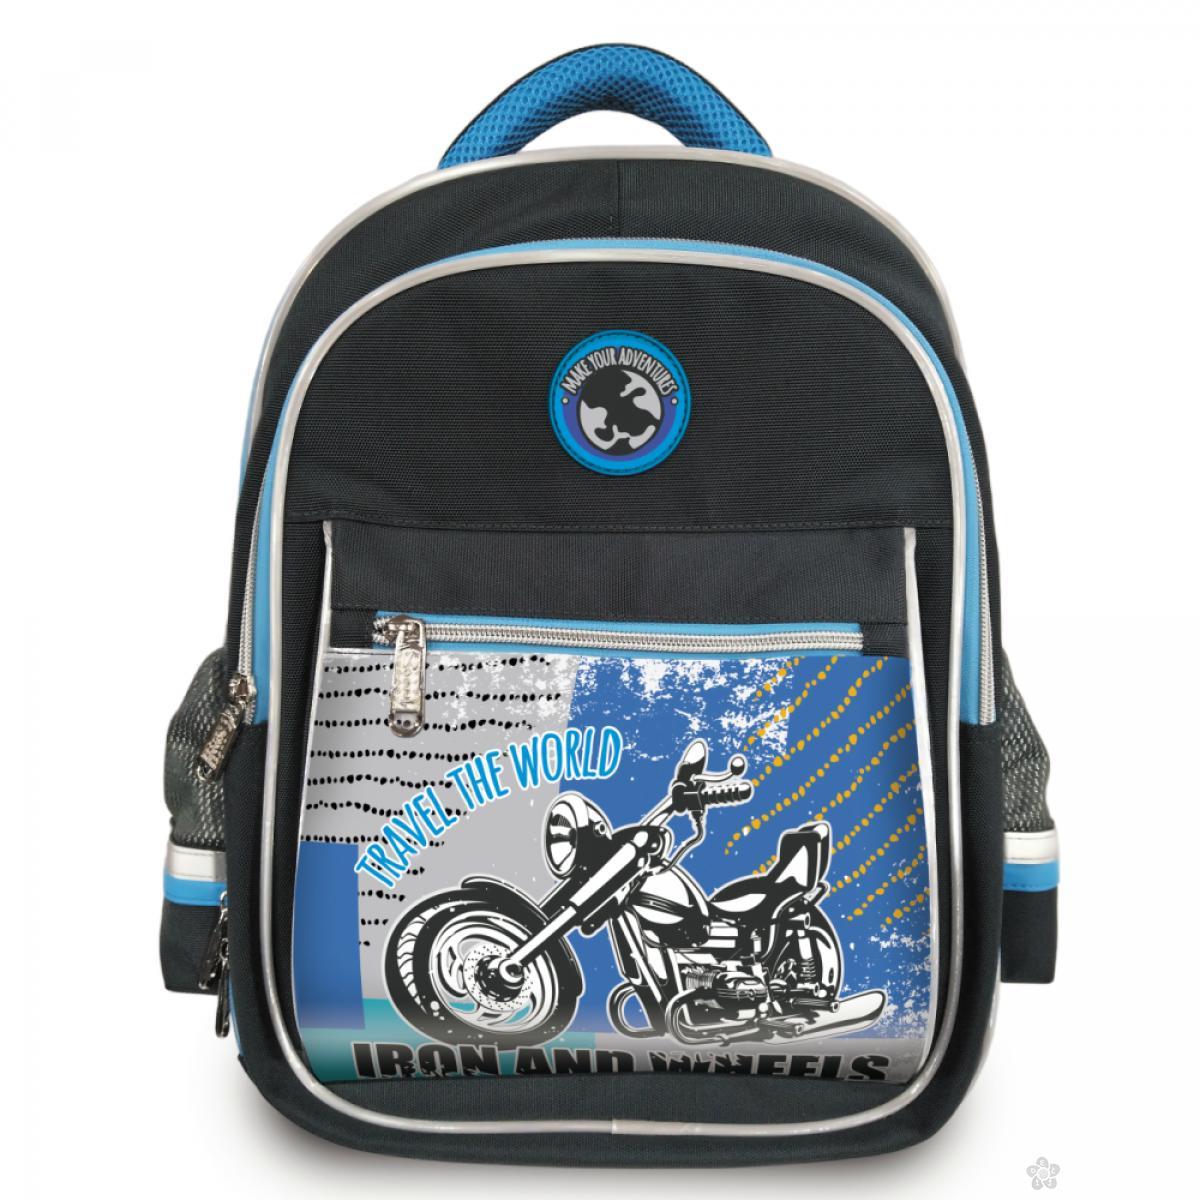 Školski ranac S-cool Motorcycle, SC560